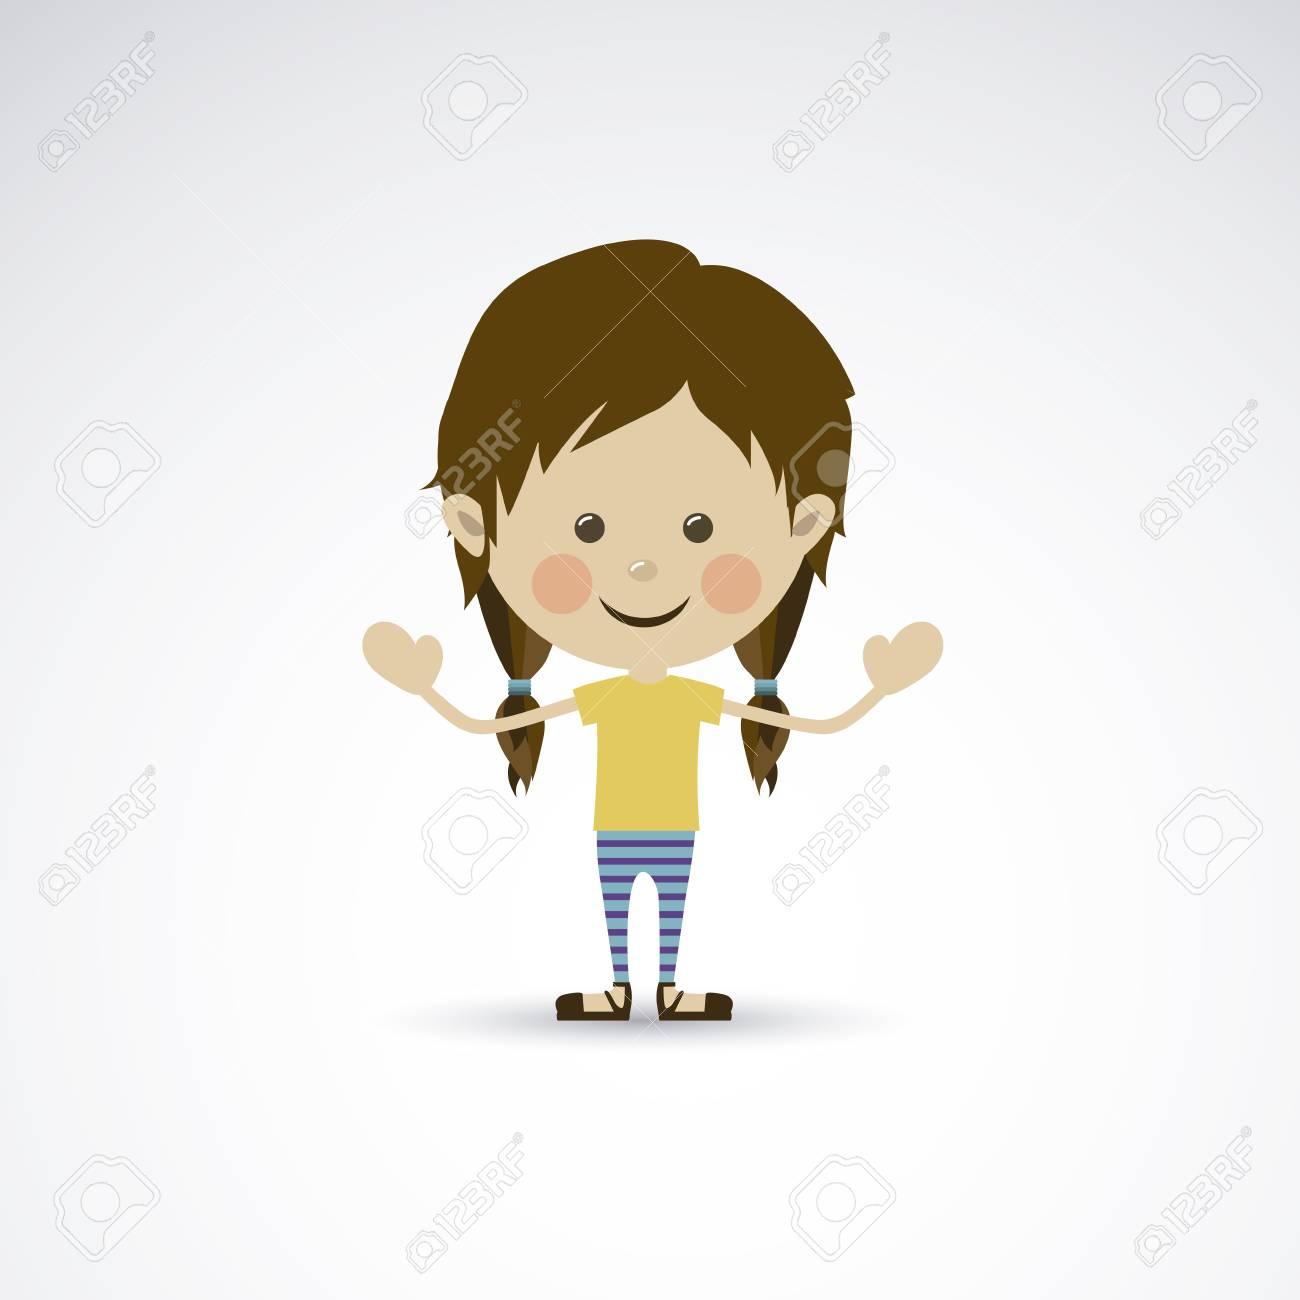 happy girl over gray background vector illustration Stock Vector - 22453316